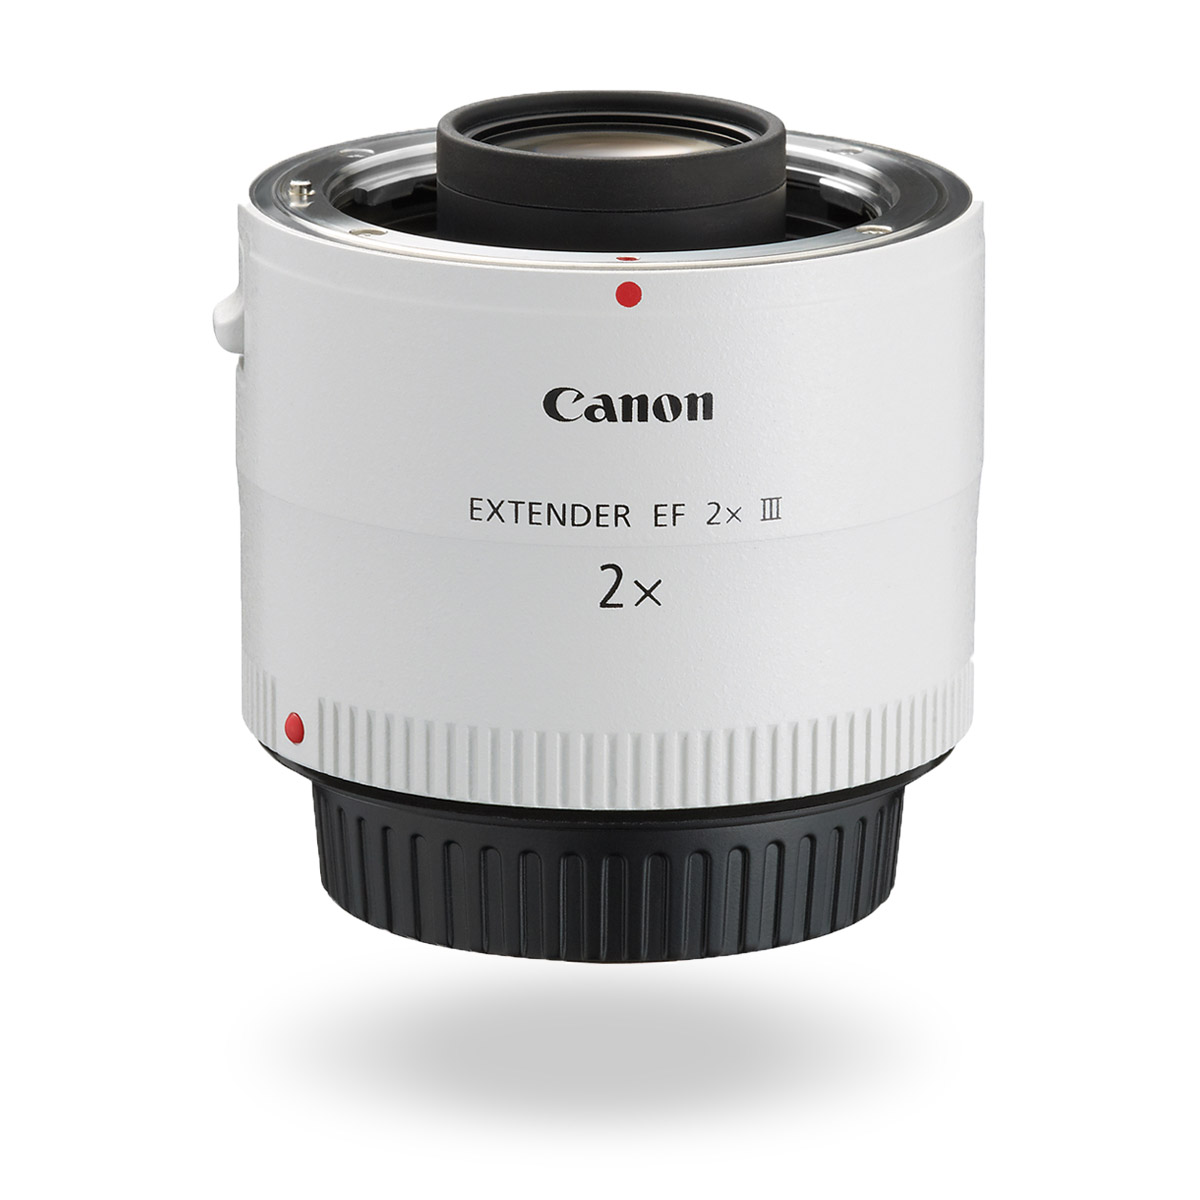 Canon EF Extender 2.0x III lens